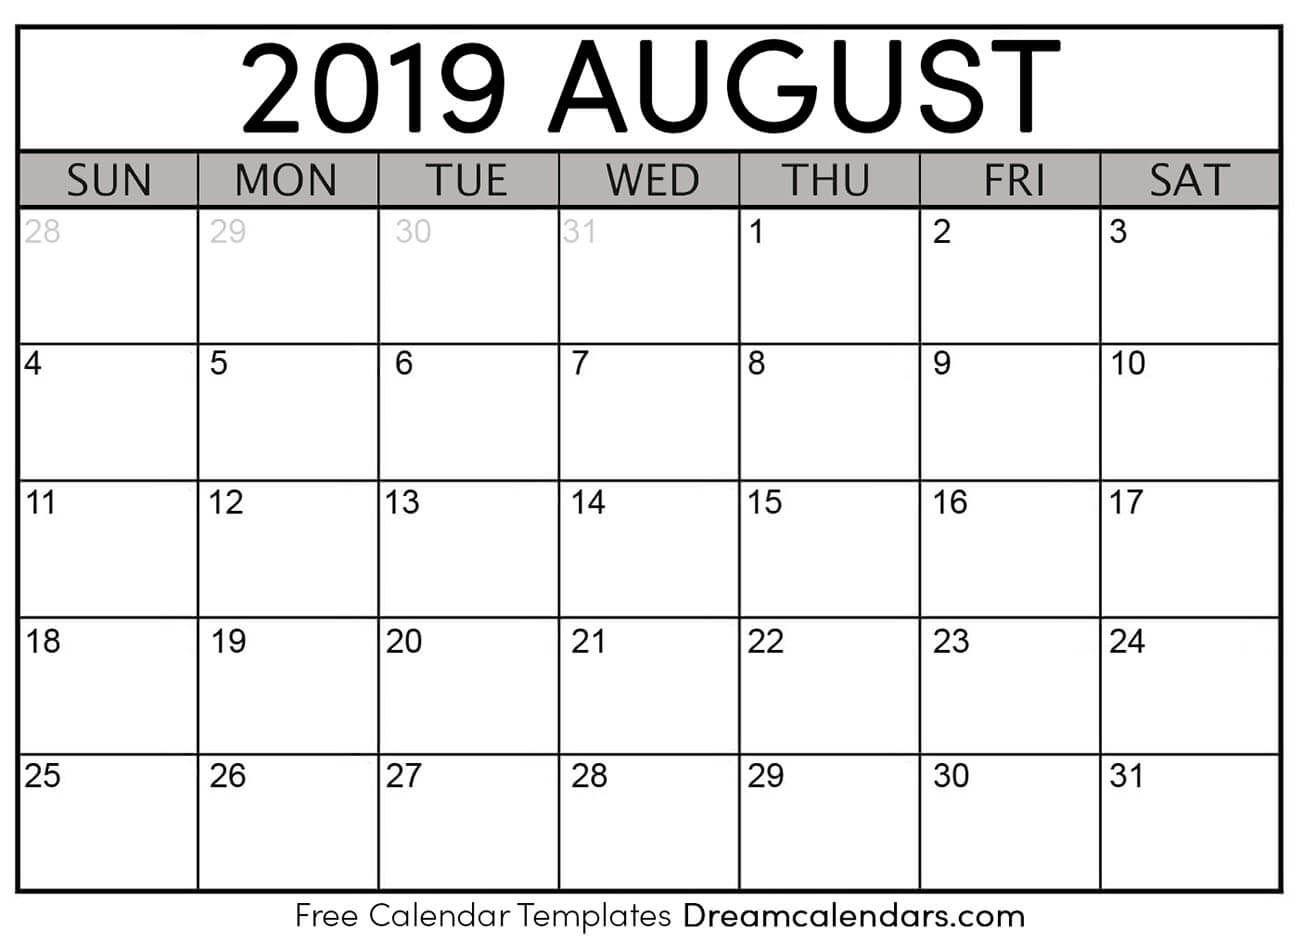 August 2019 Calendar Printable Pdf | Calendar Format Example within Printable Free August Calendar Template With Clown